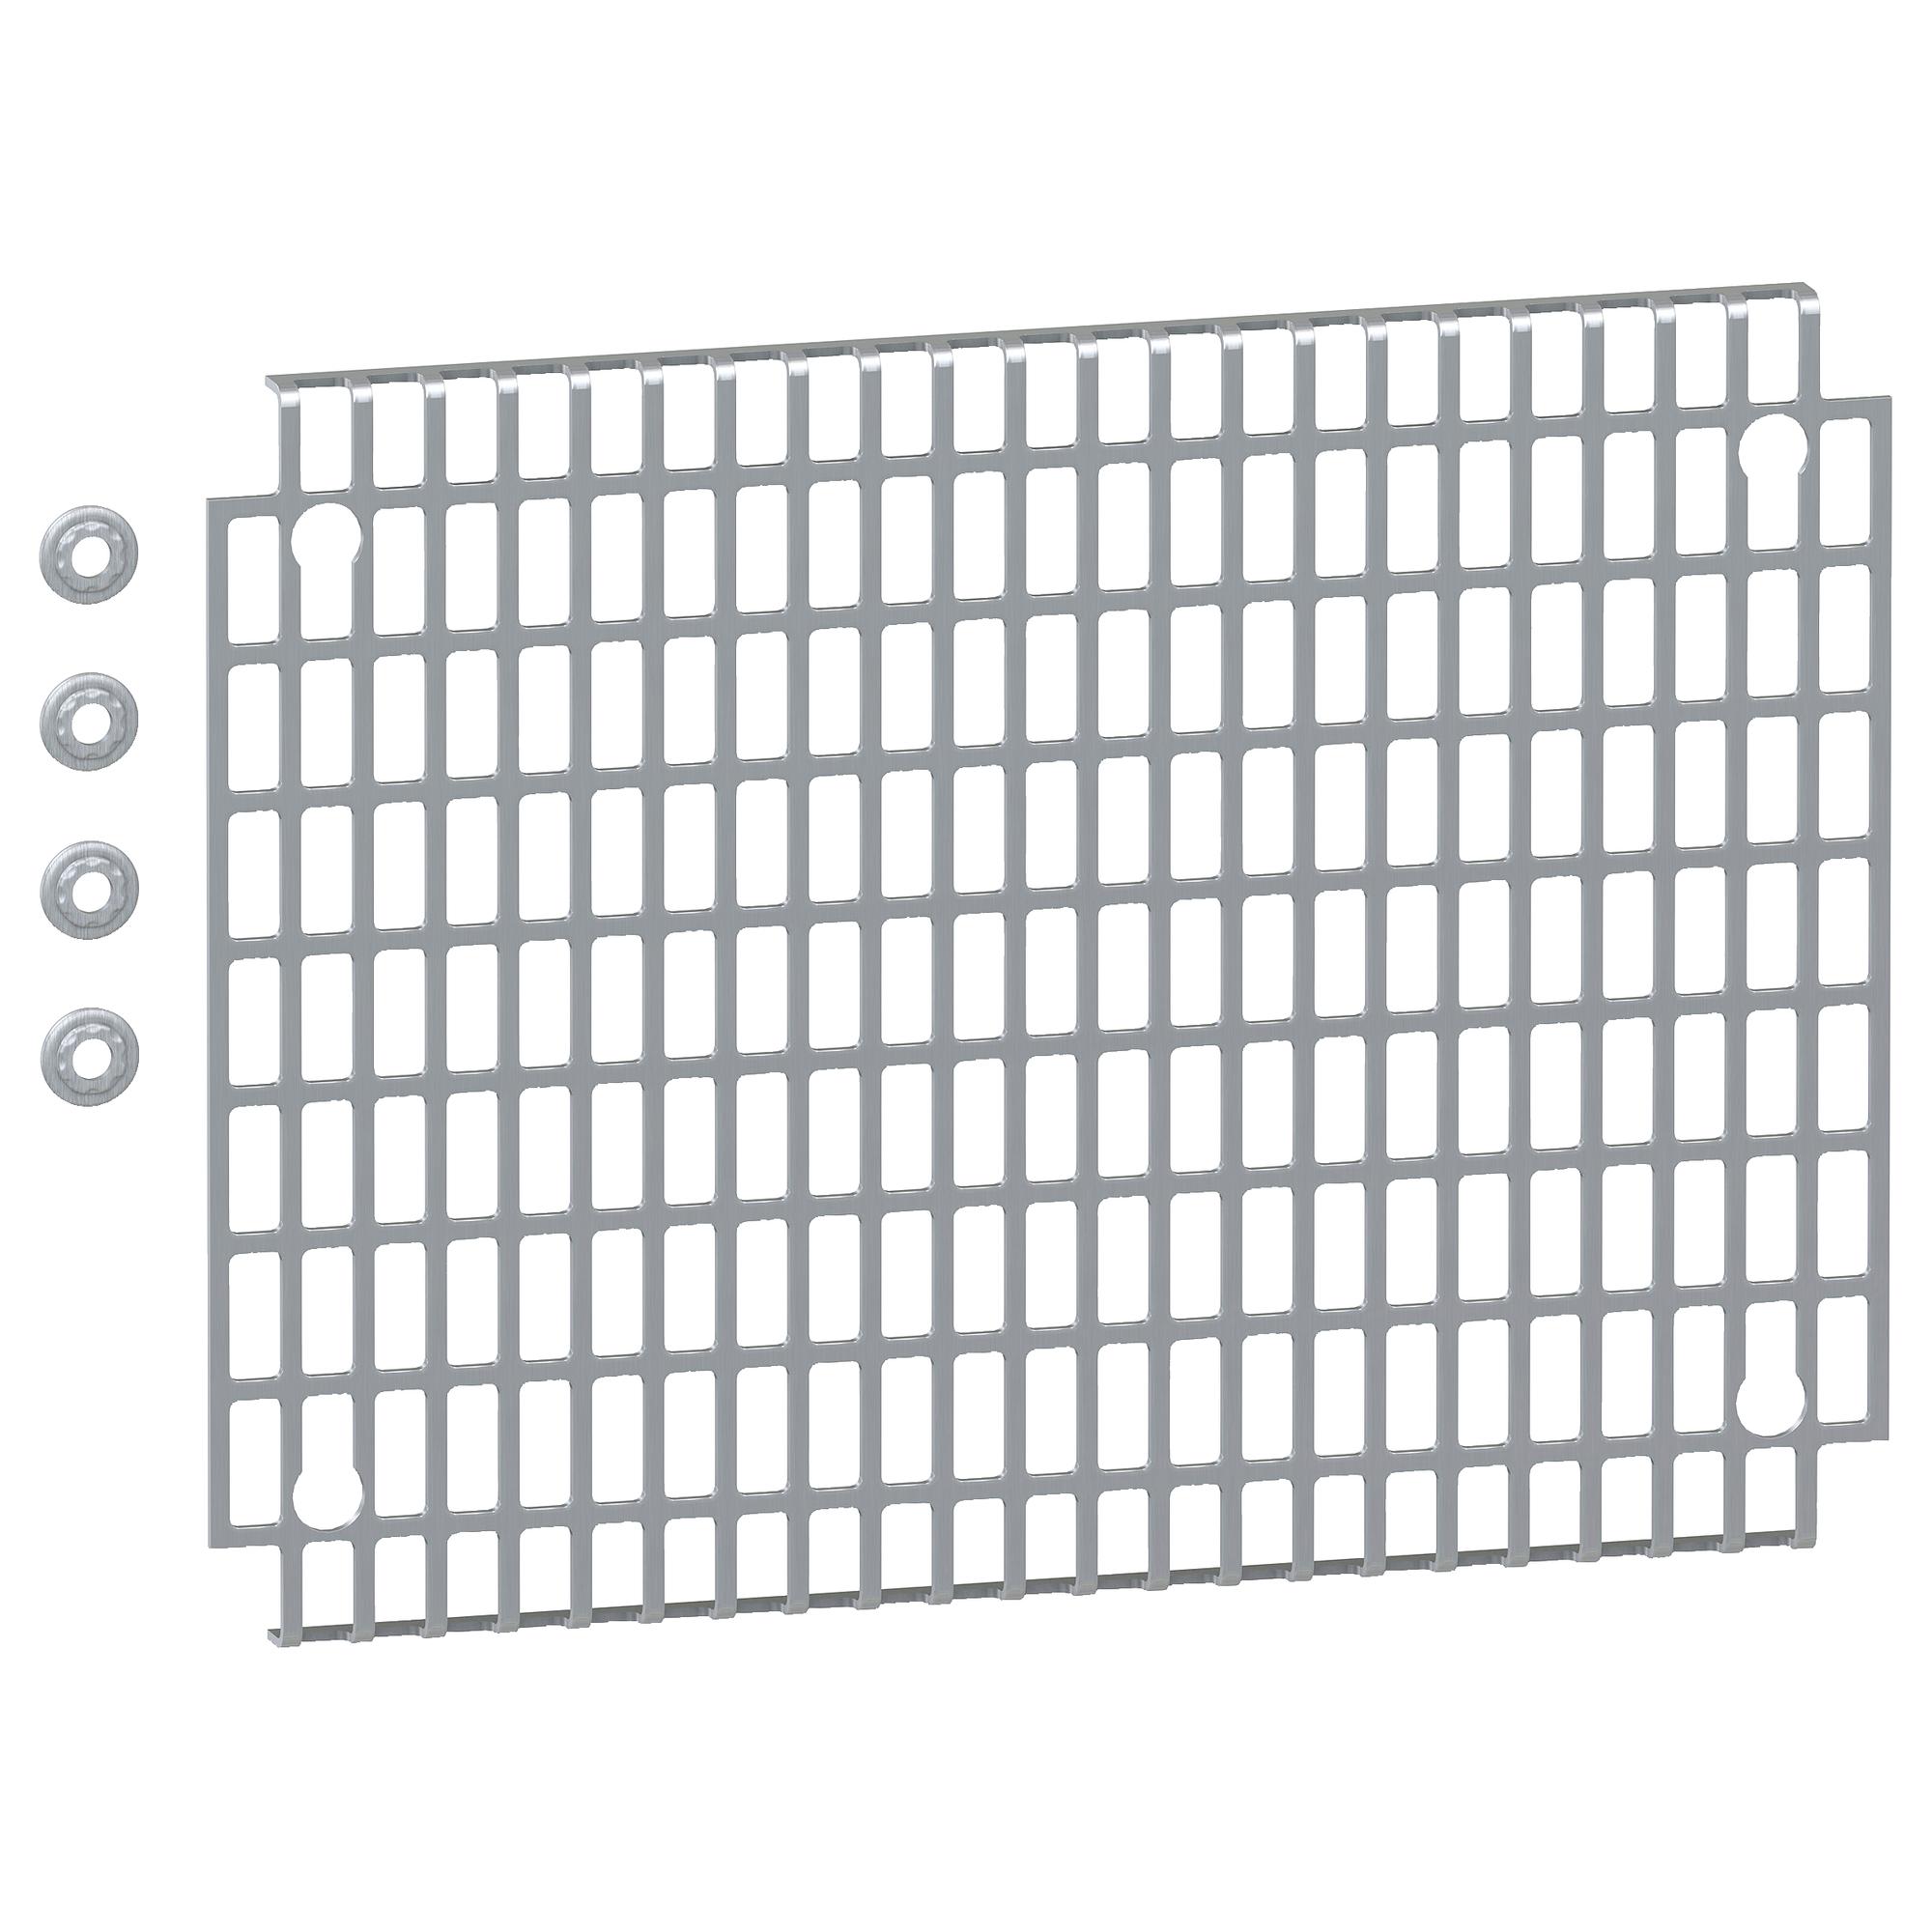 Image Description for https://tedi.itc-electronics.com/itcmedia/images/20190424/SV/__1.jpeg